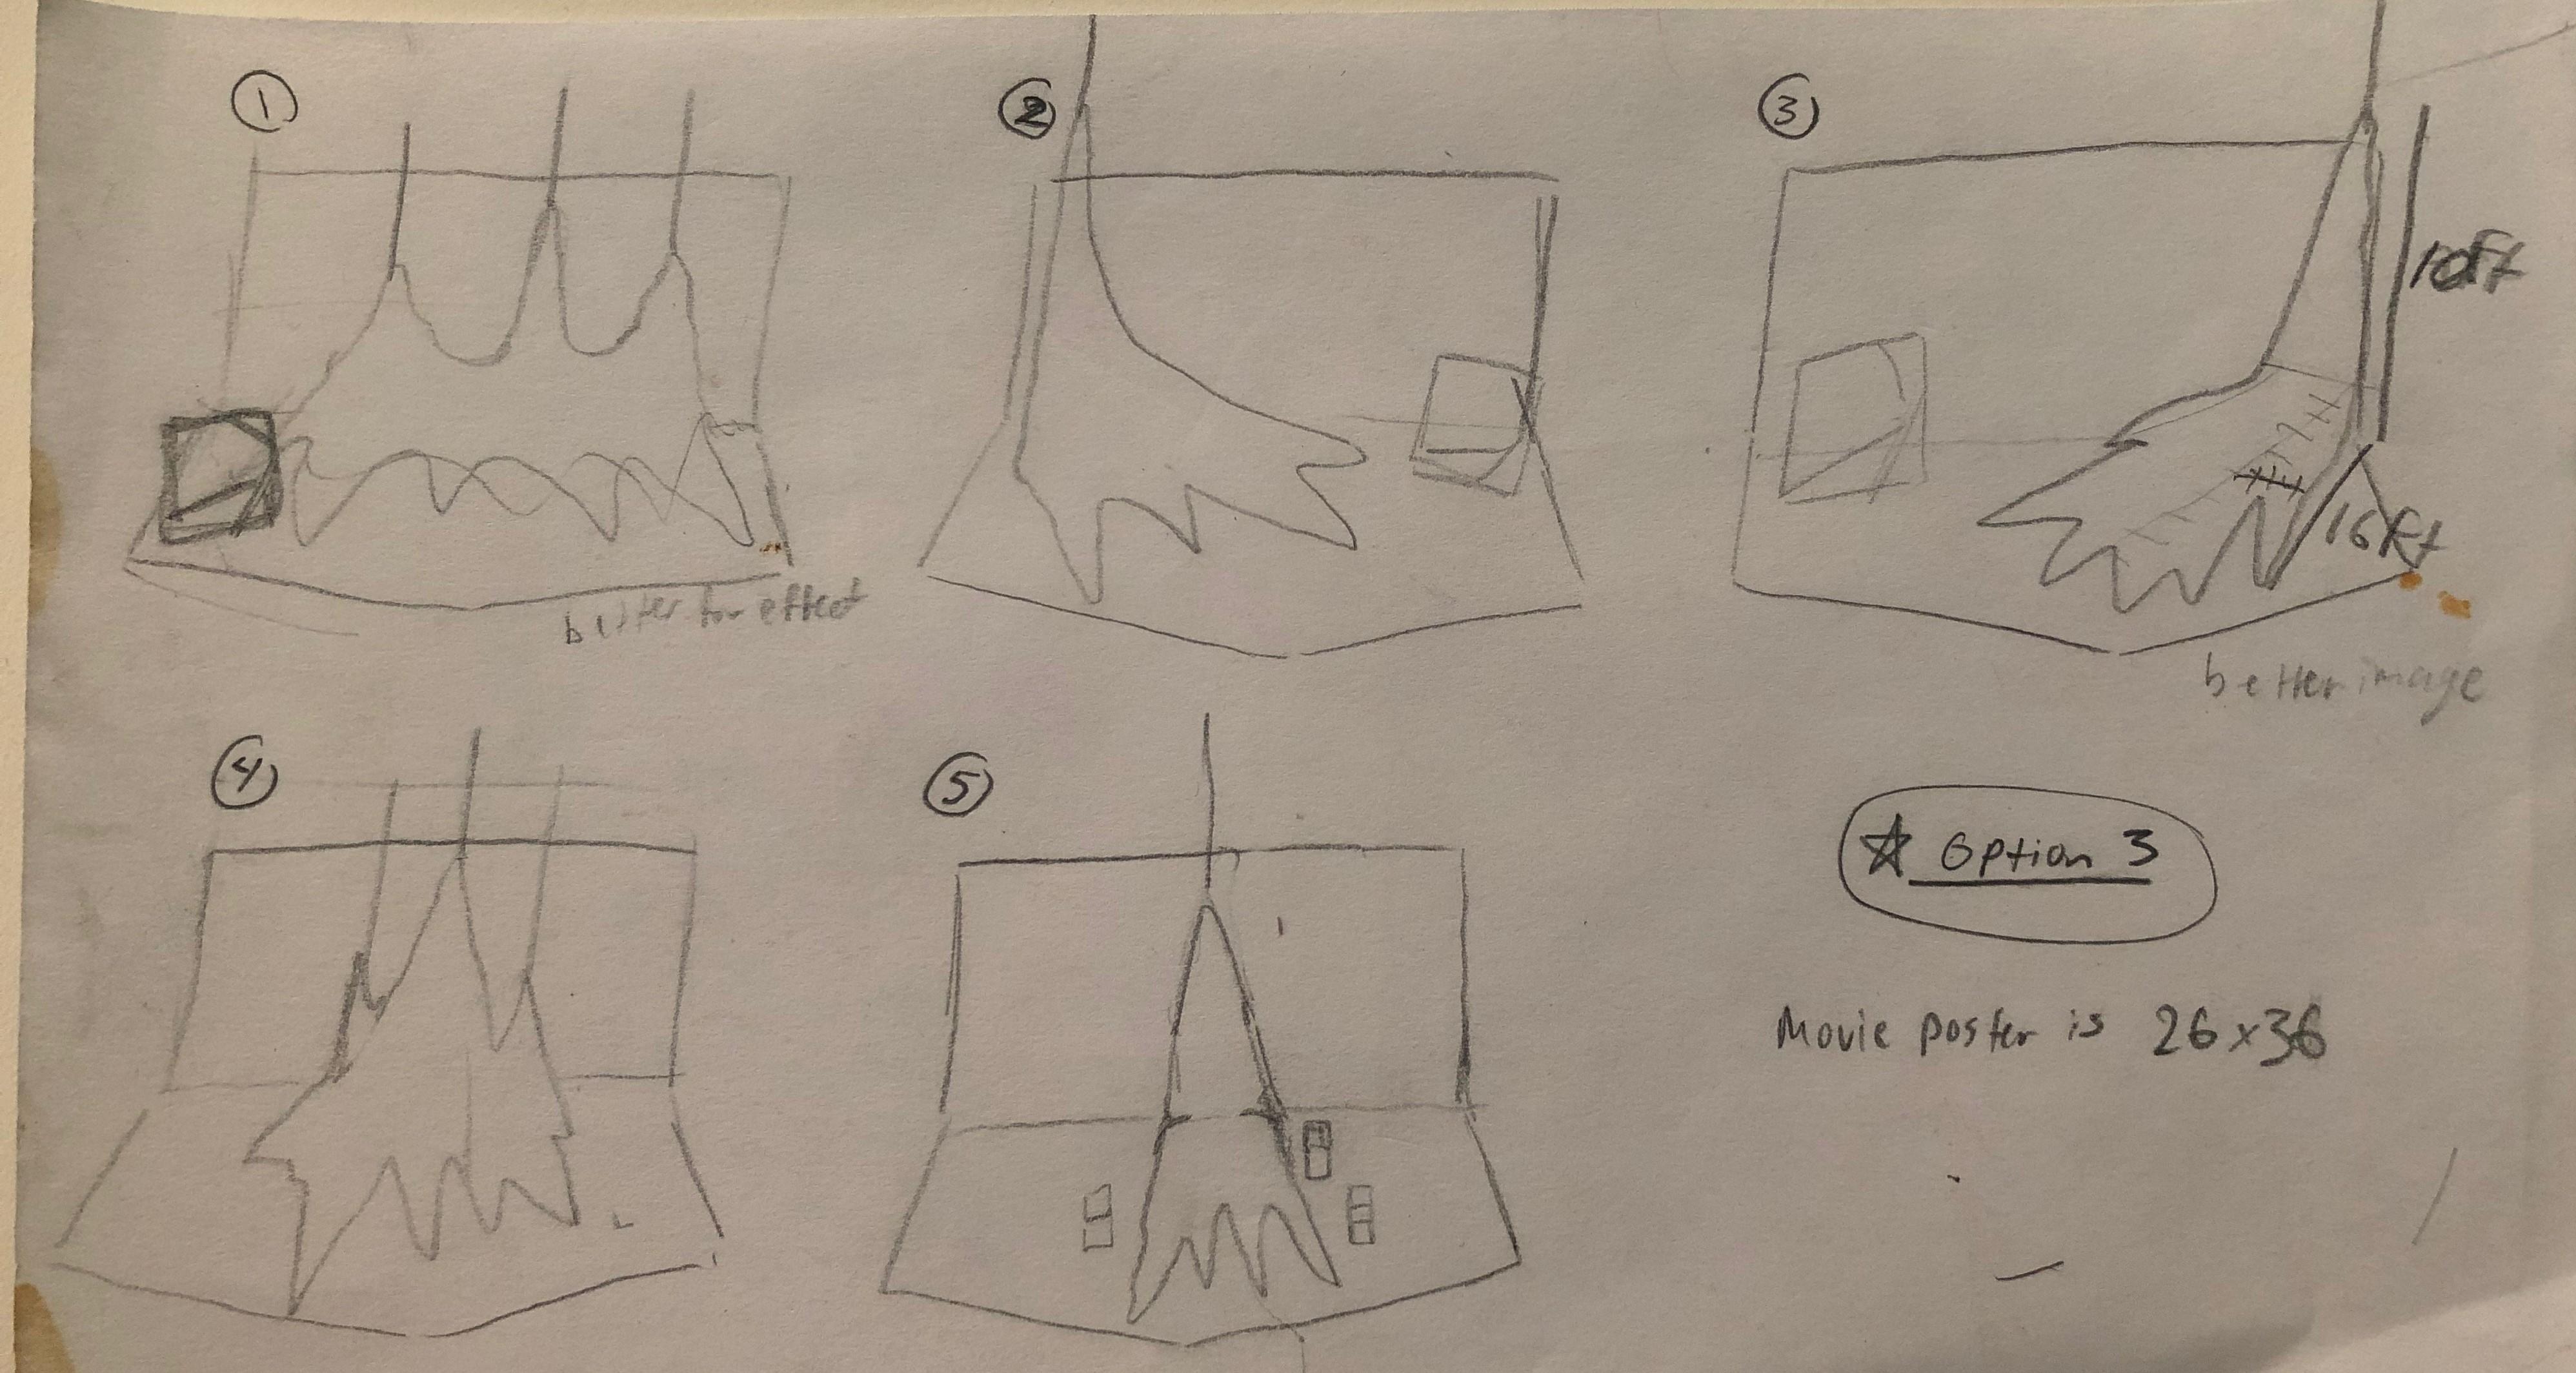 Conceptual Sketch of Large Stalagmite